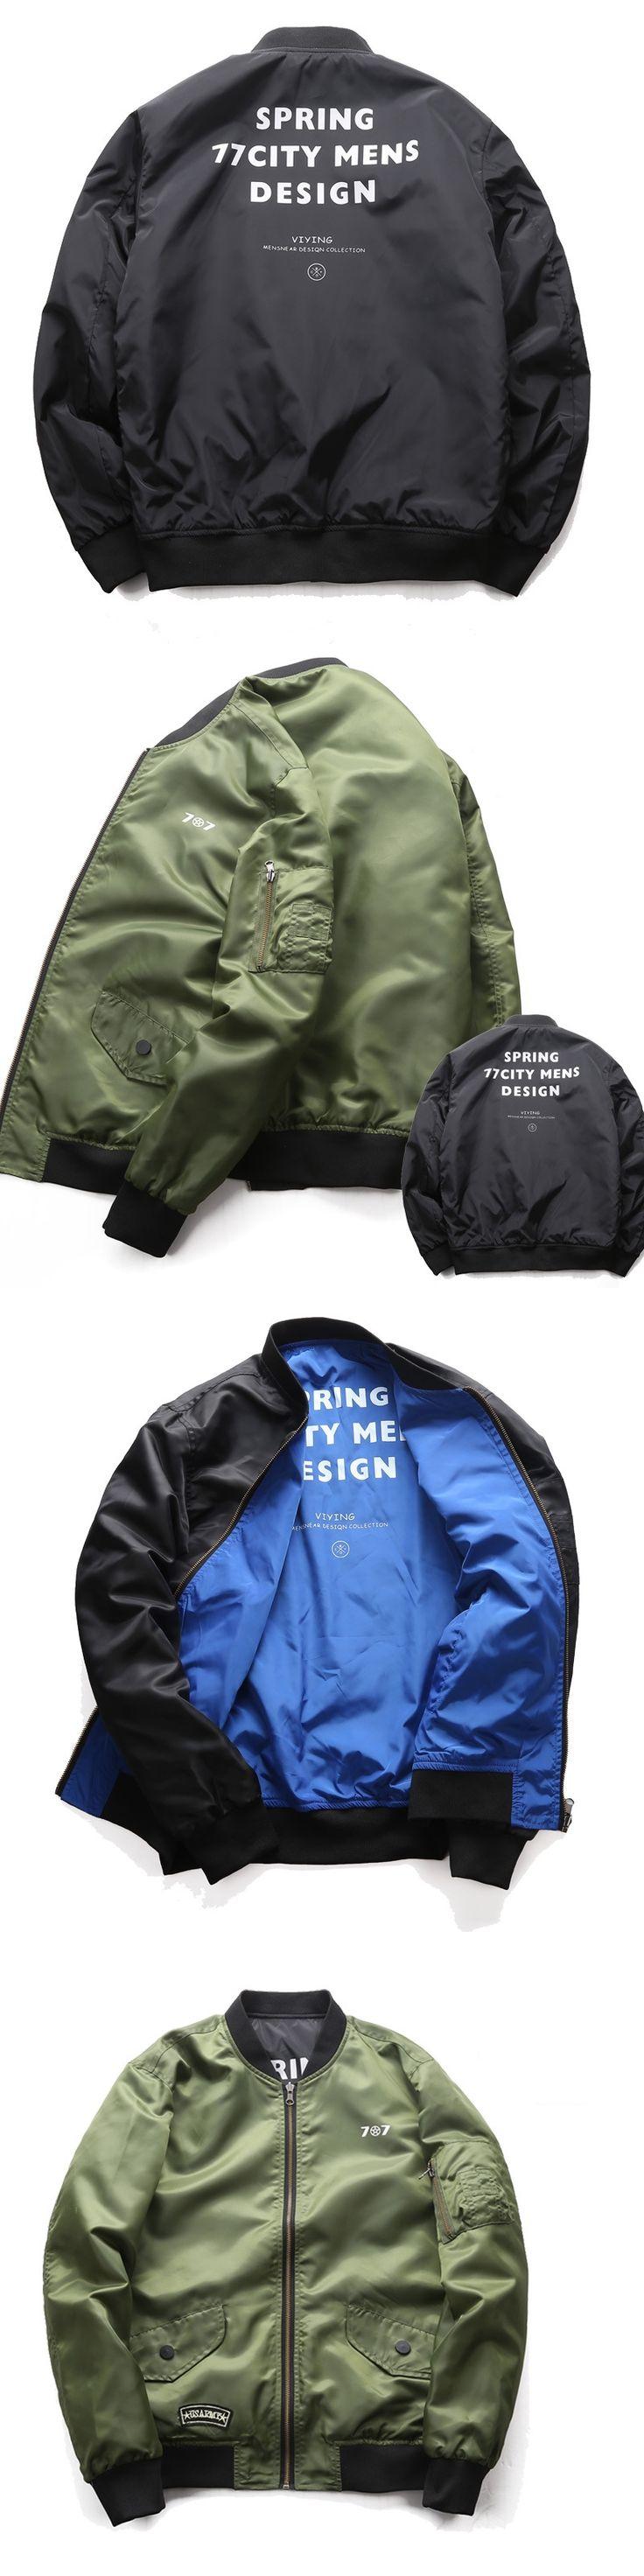 Men Bomber Jacket 2017 New Winter Spring Men Army Green Merch Flight Coats Fashion Air Force One 6XL Jacket